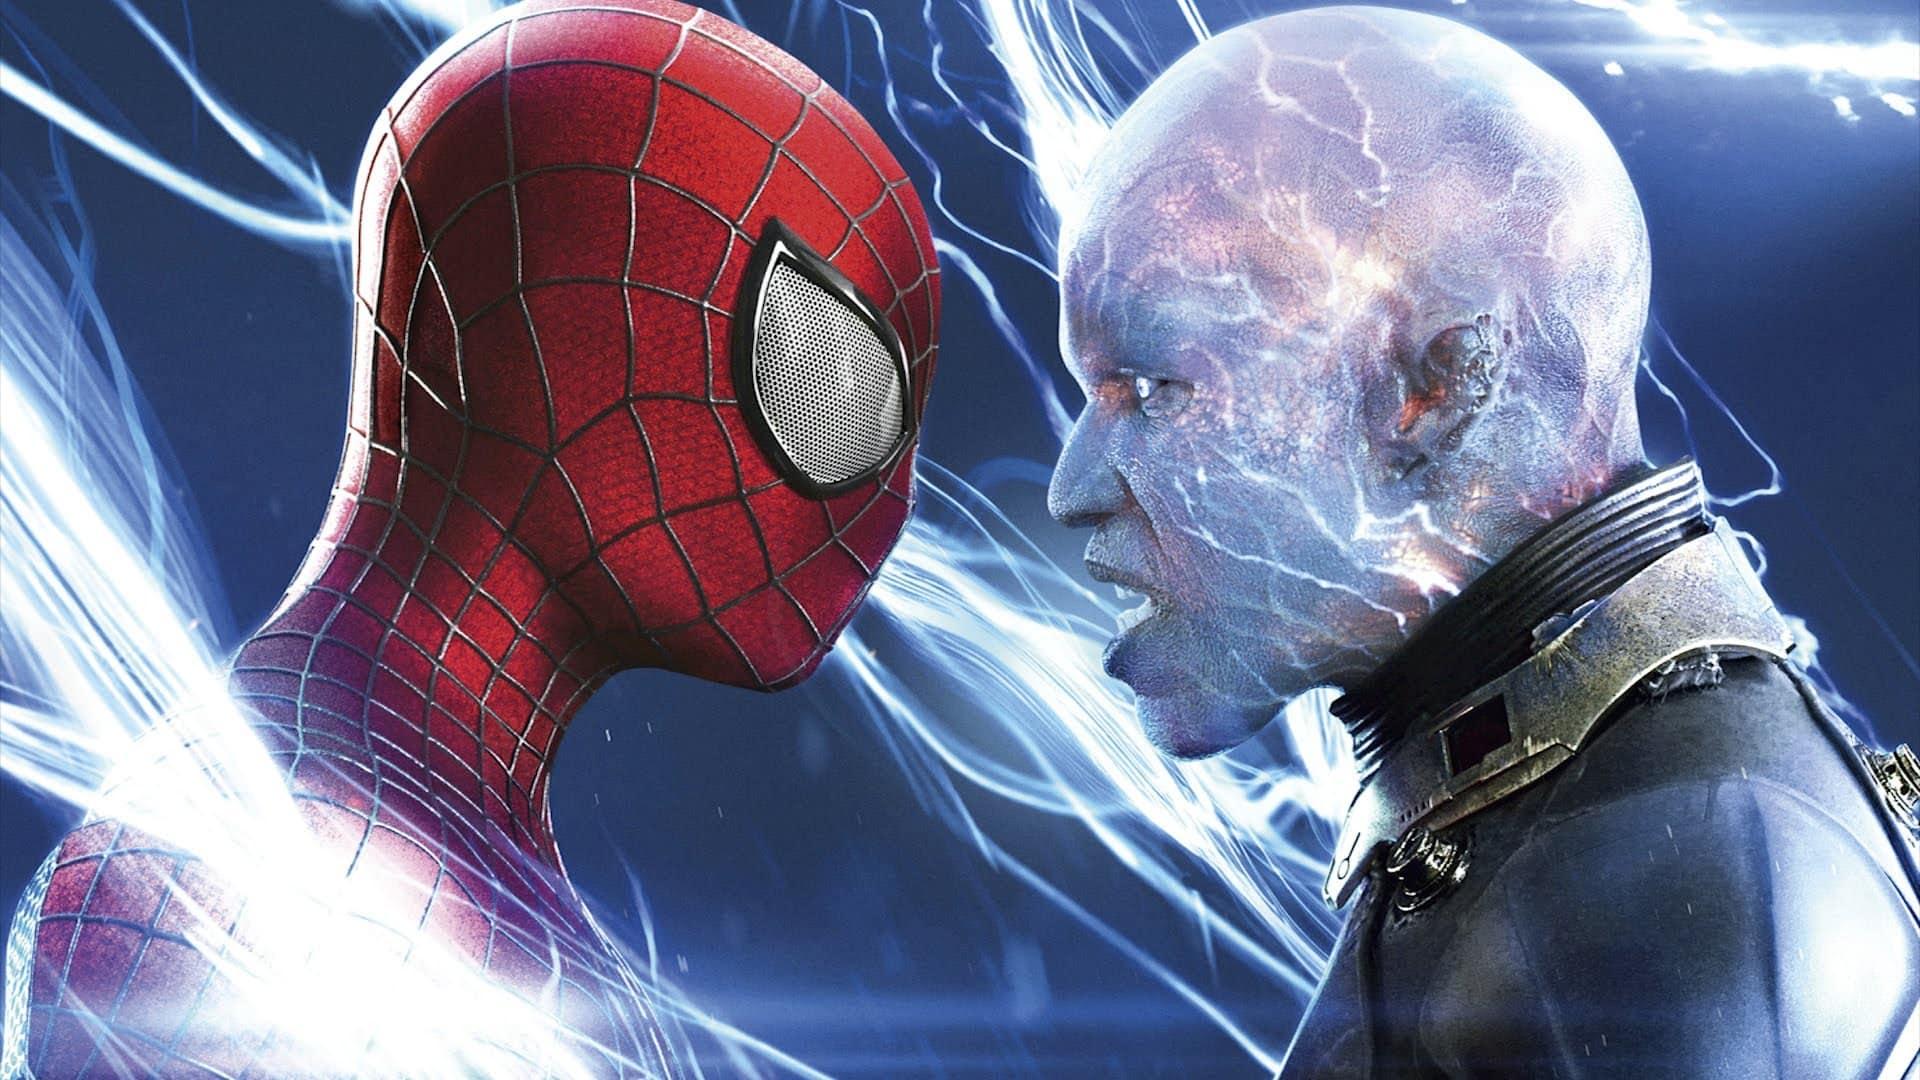 the amazing spider-man 2 honest trailer